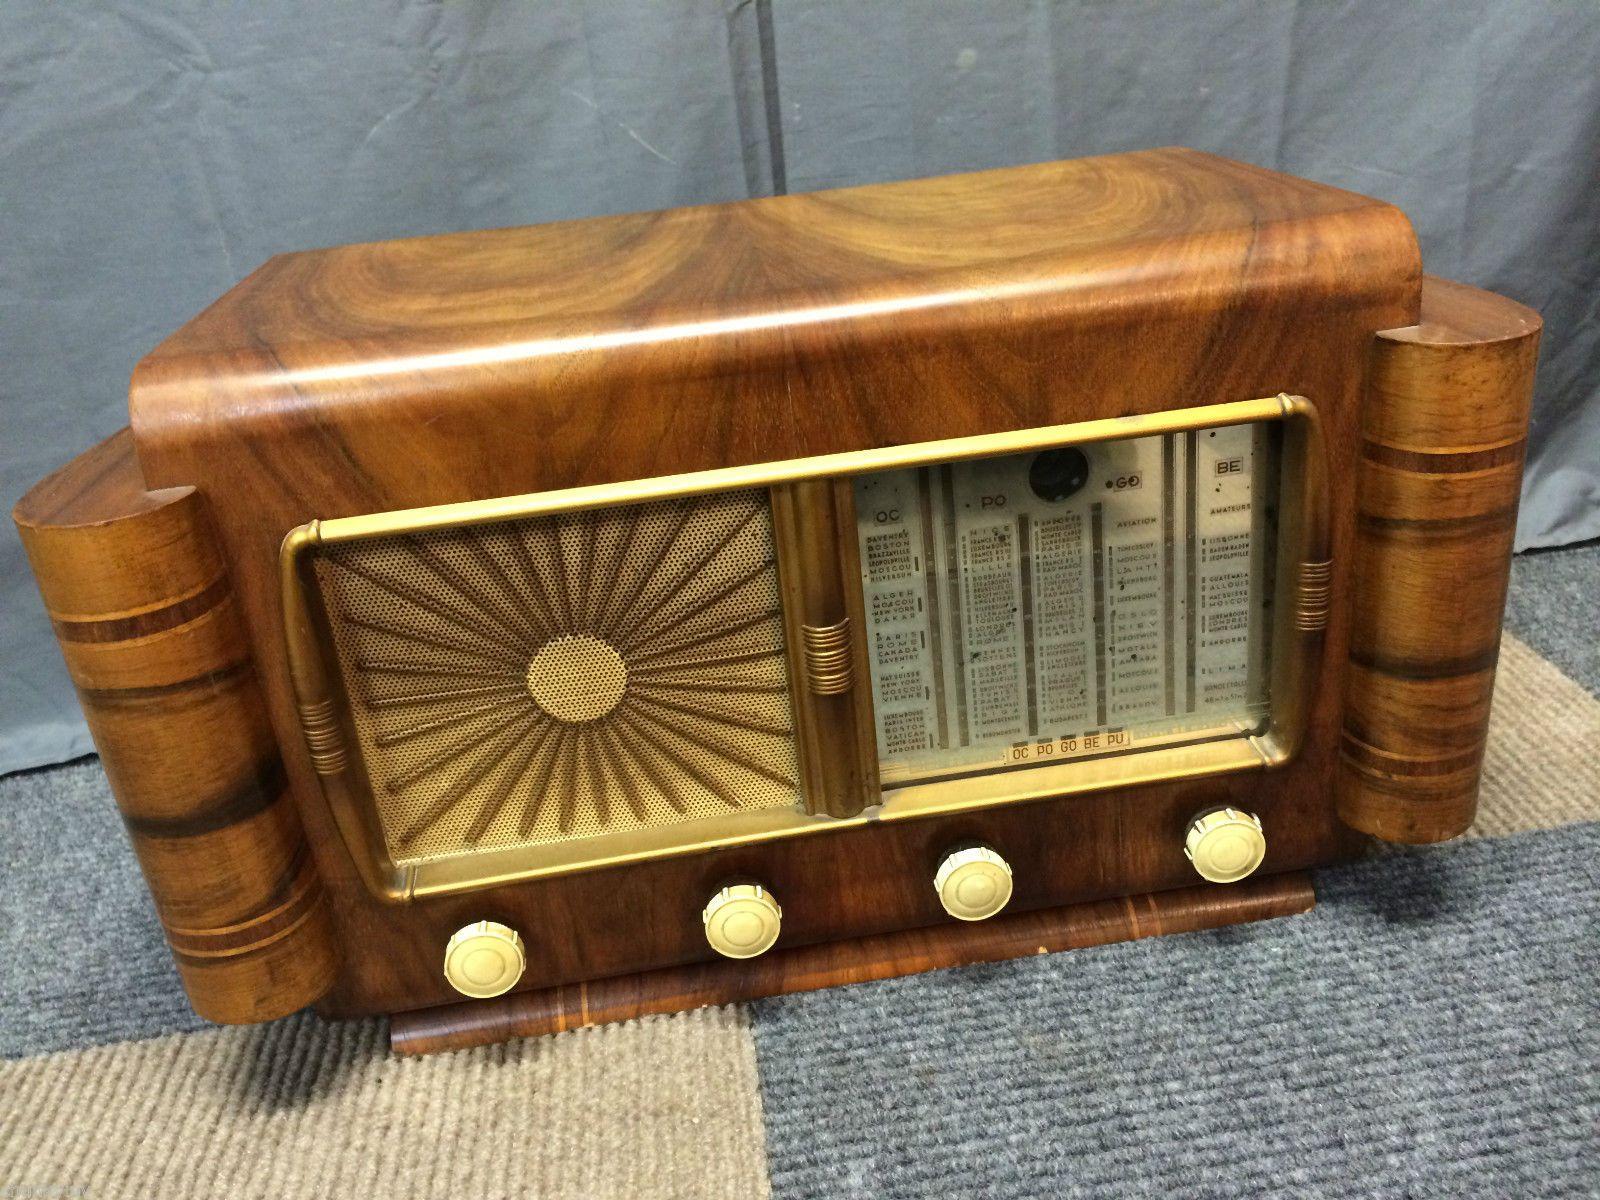 Rare Vintage Antique 40 50s French Shortwave War Musicalpha Speaker Tube Radio Ebay Vintage Radio Antique Radio Retro Radios